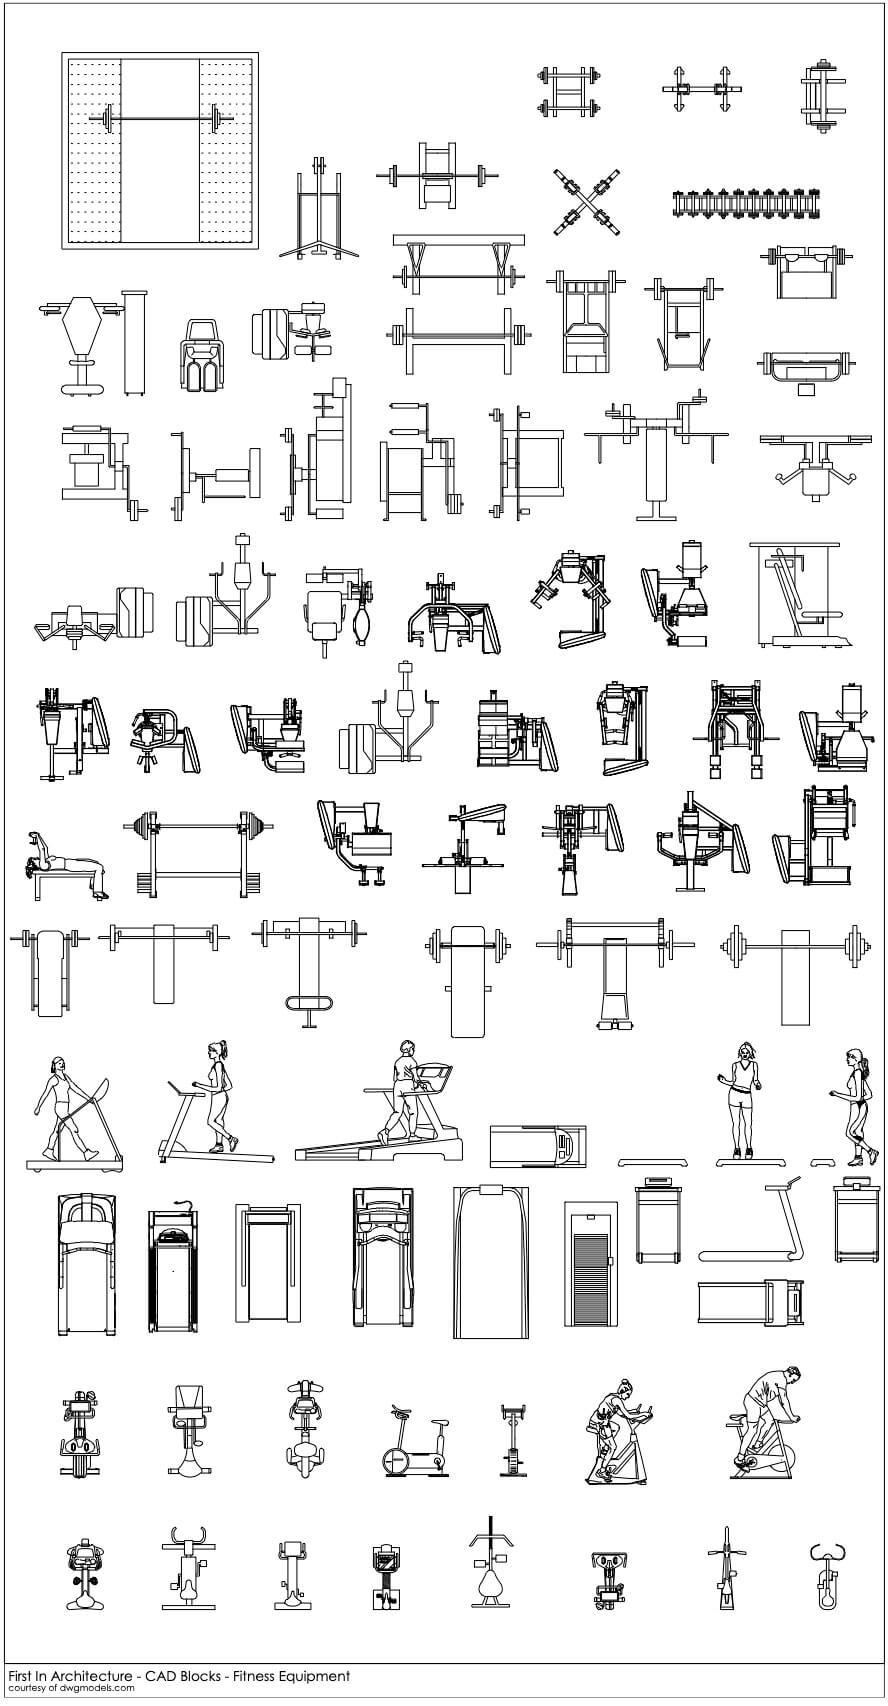 FIA CAD Blocks Fitness Equipment 1